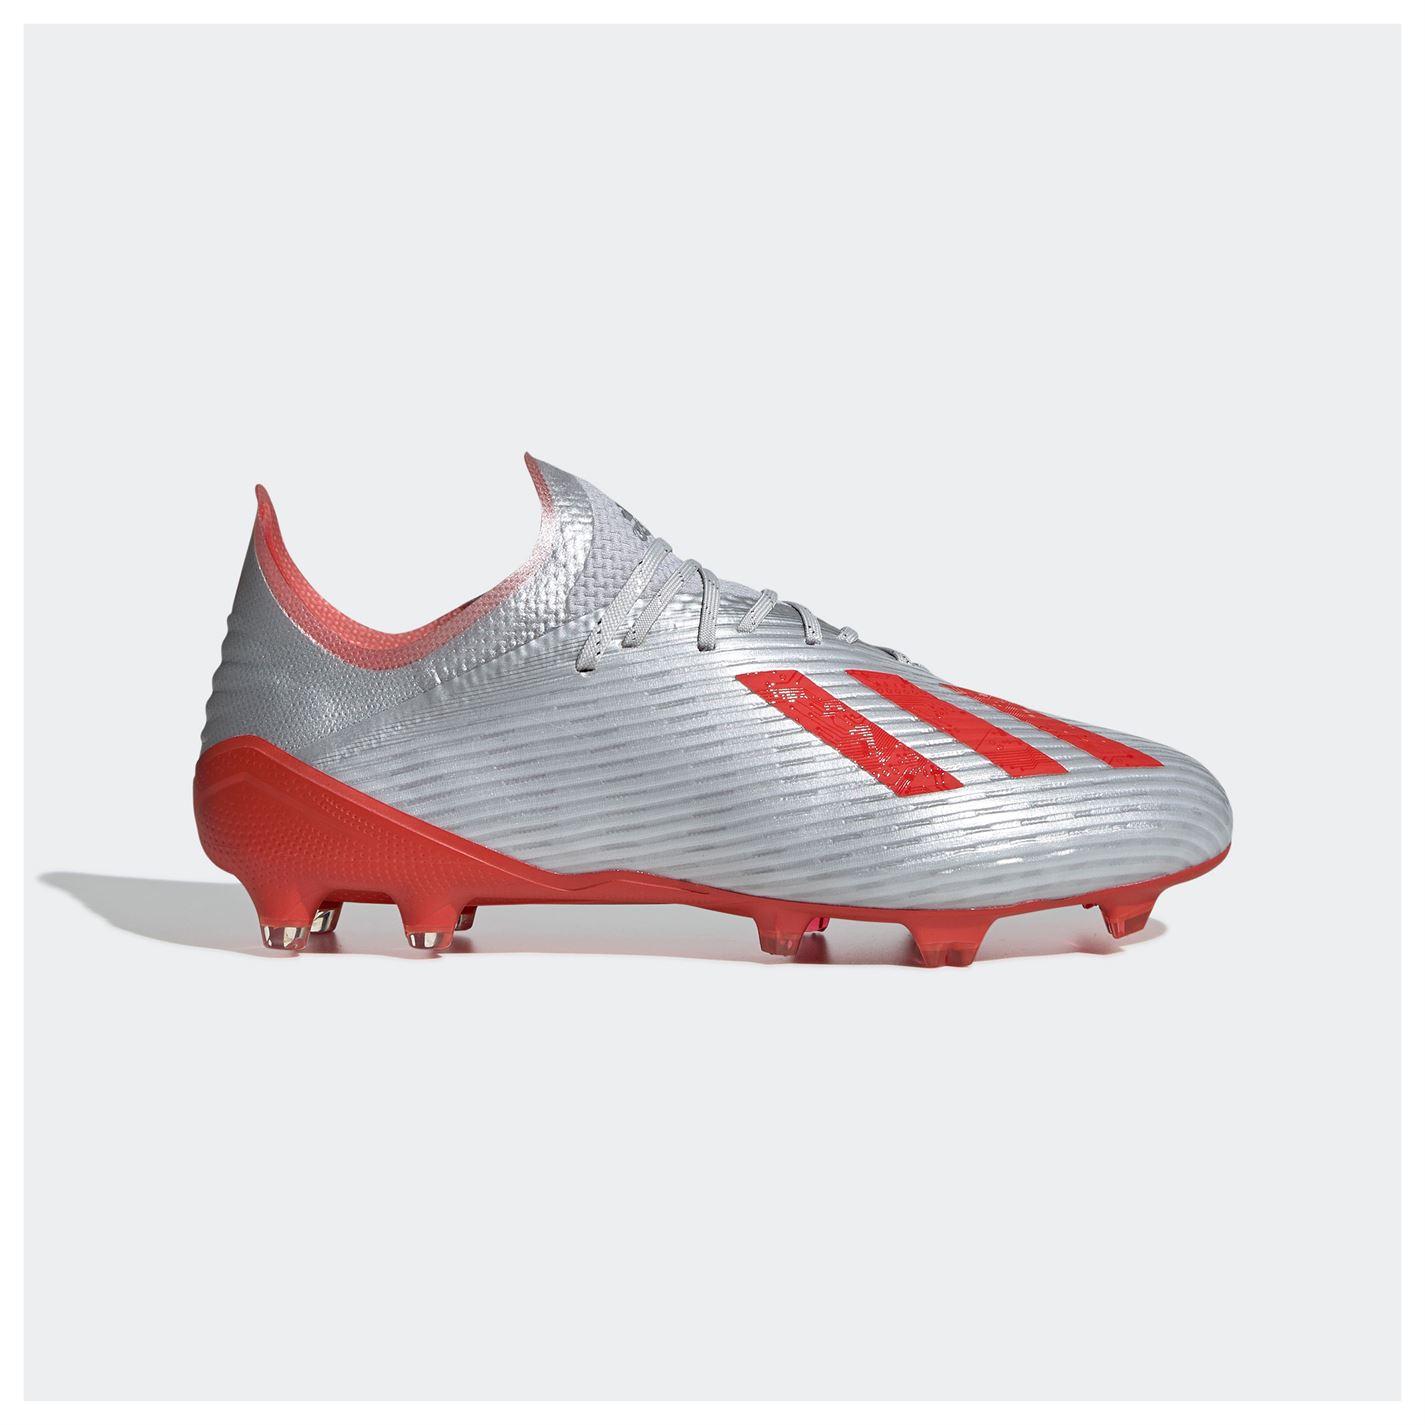 Adidas X 19.1 Mens FG Football Boots